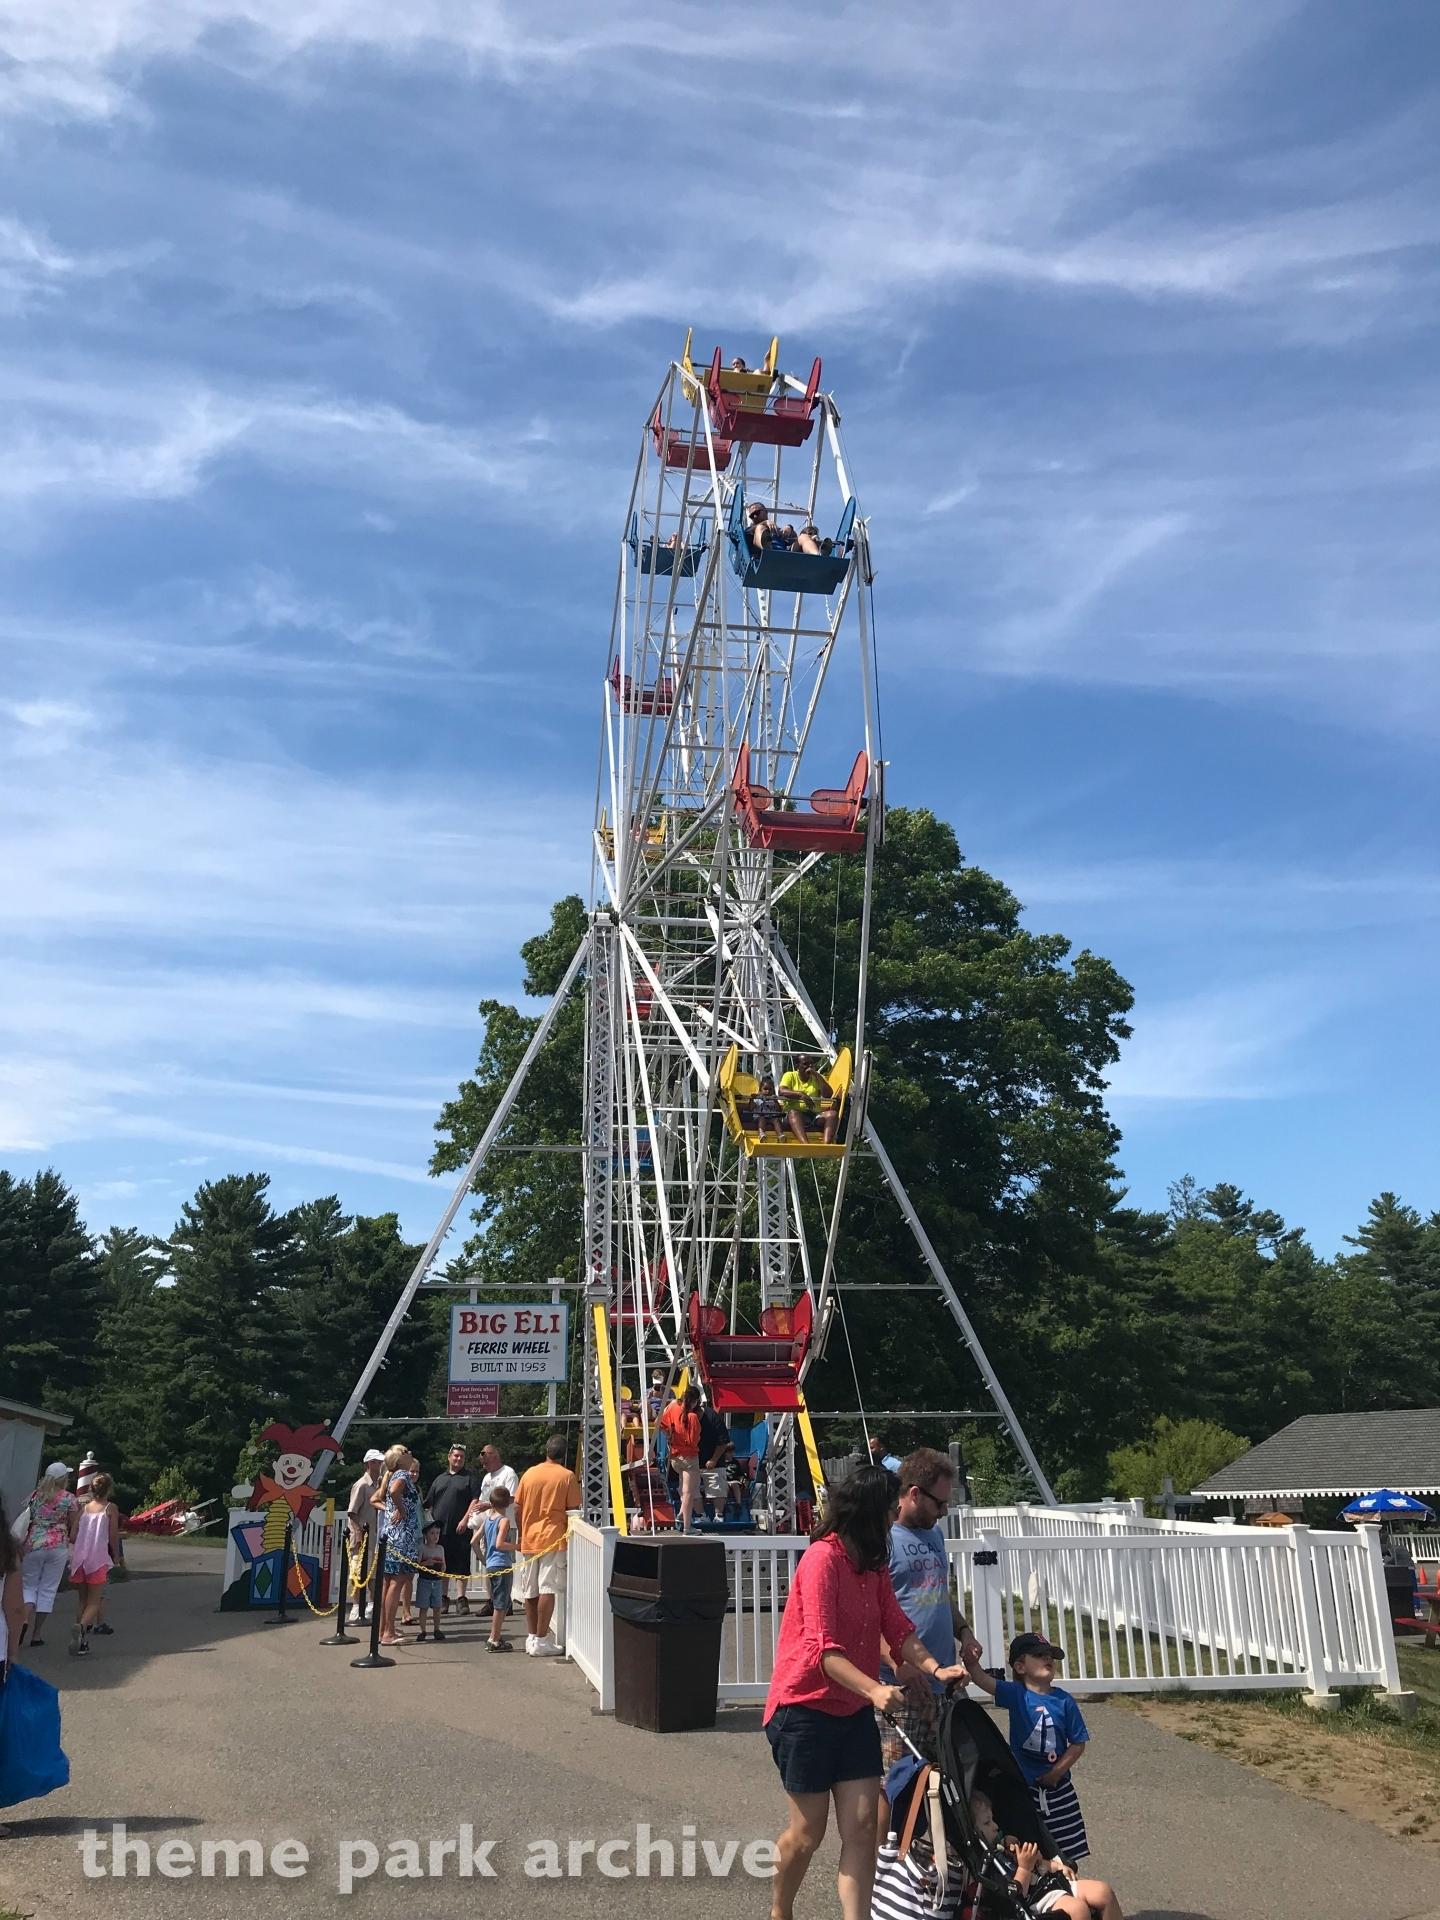 Big Eli: The Ferris Wheel at Edaville Family Amusement Park